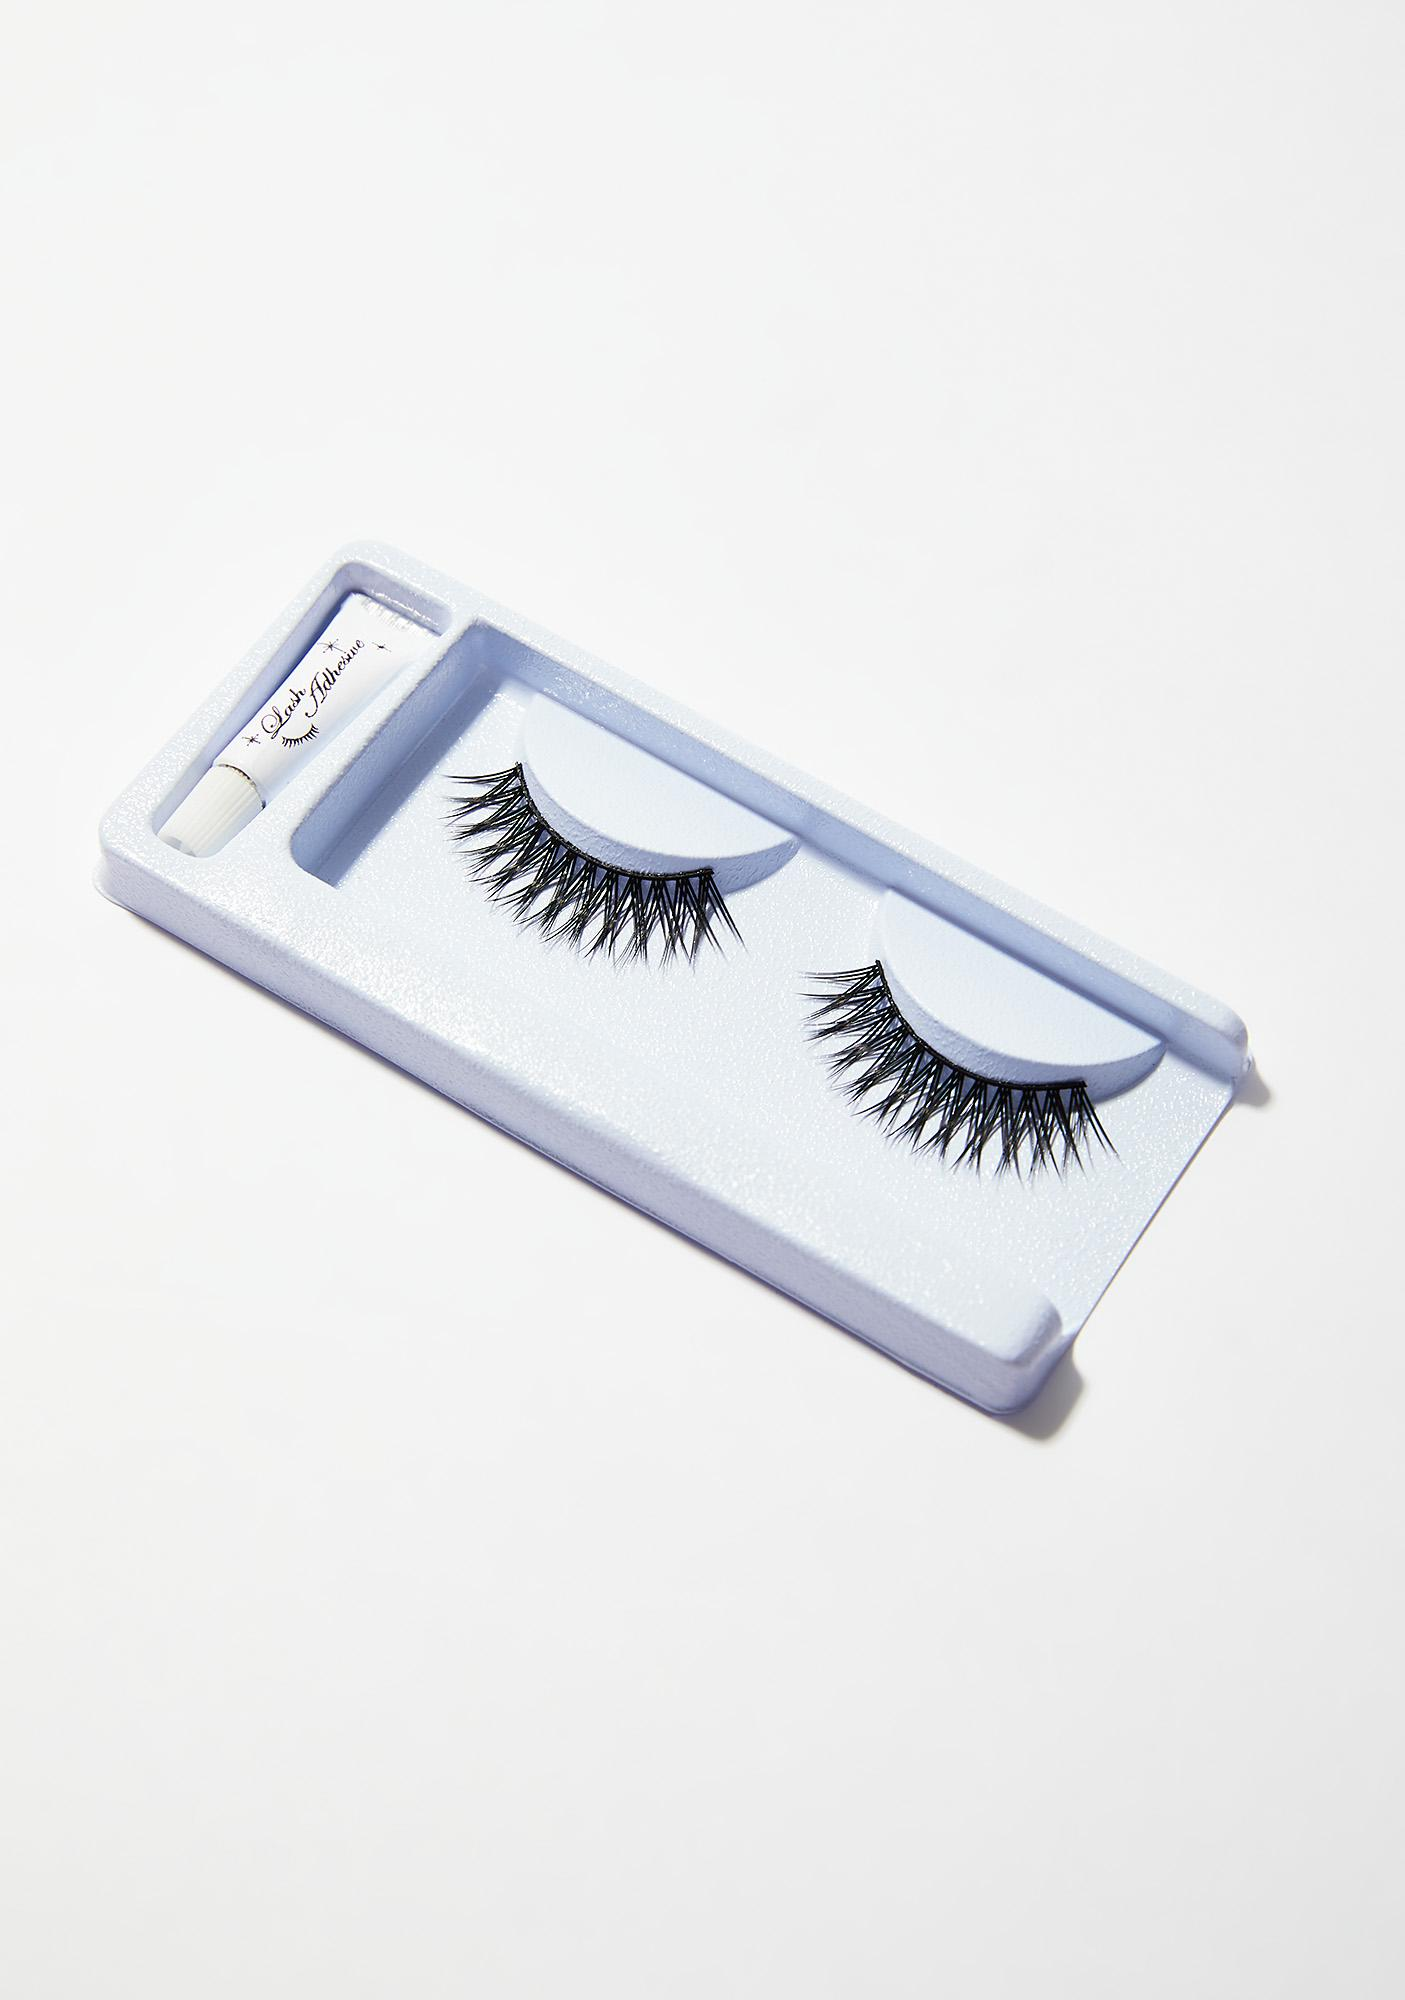 NYX Nirvania Fabulous Lashes & Glue